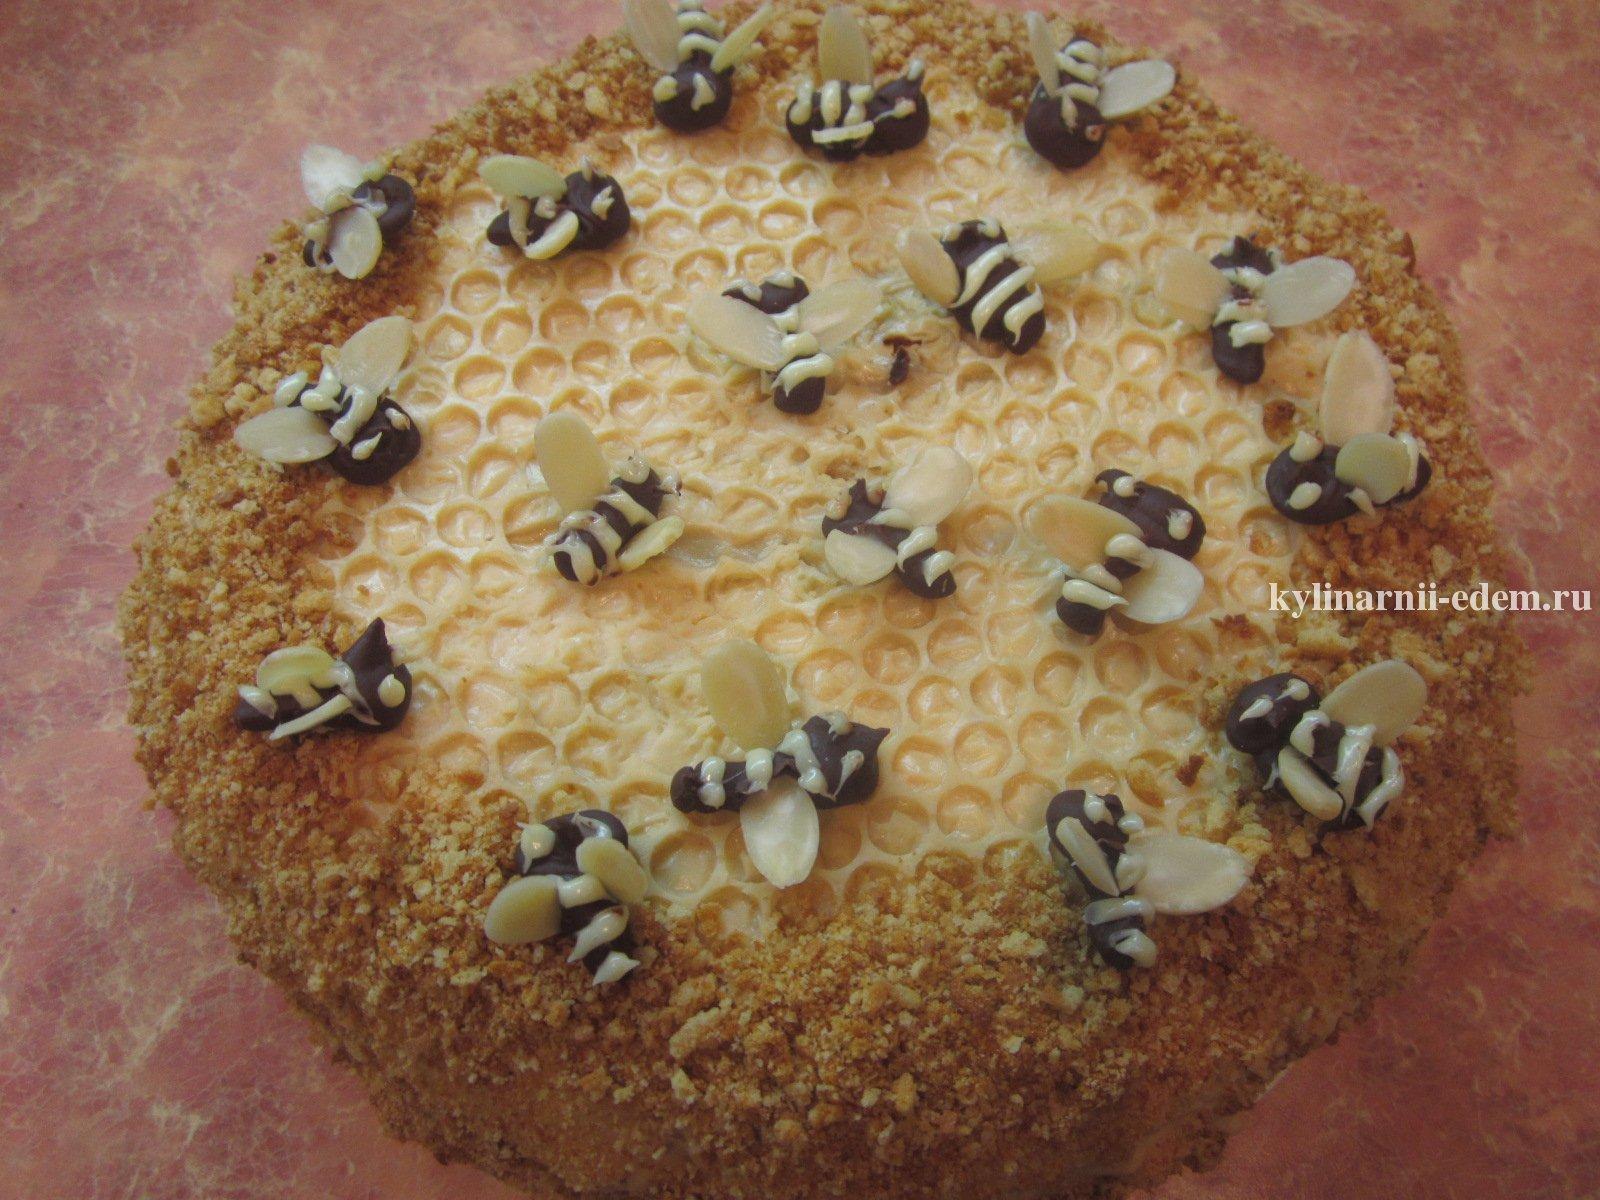 Торт пчелка рецепт с фото пошагово в домашних условиях 810